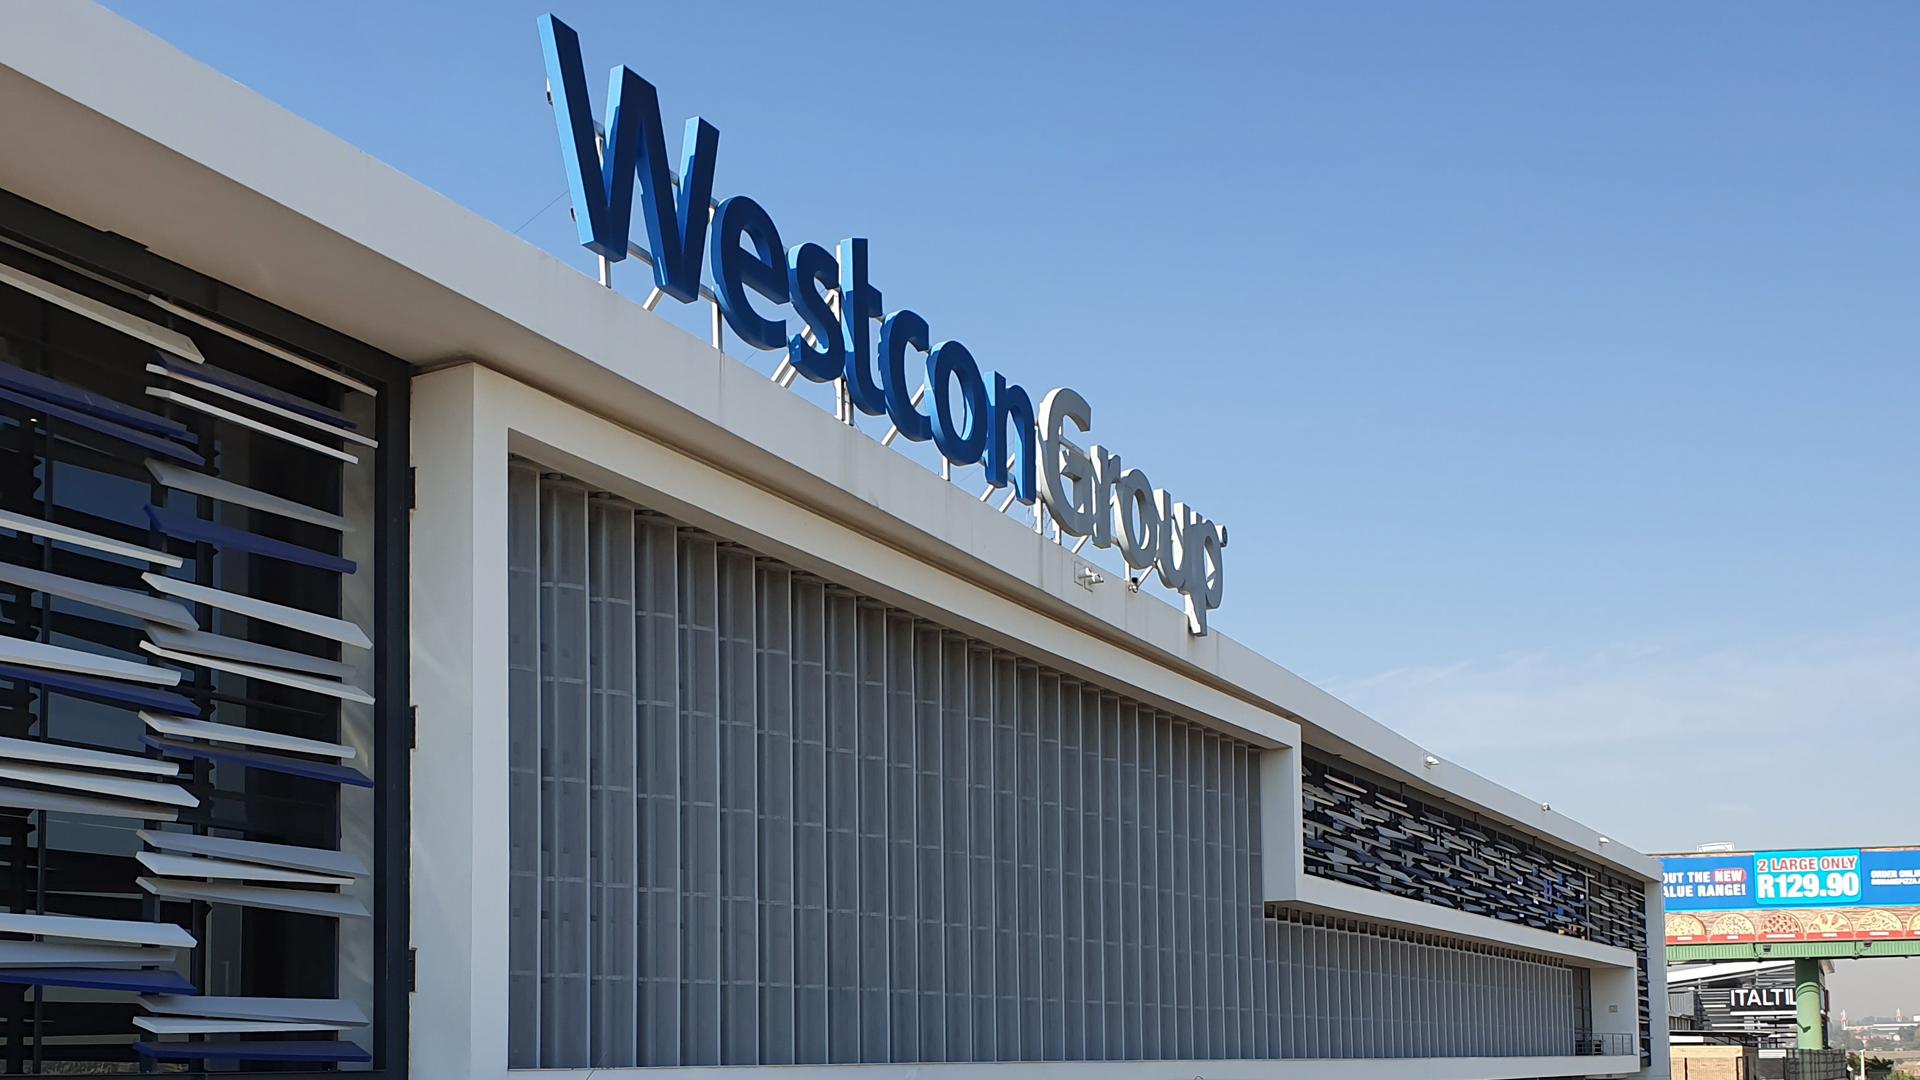 westcon-group